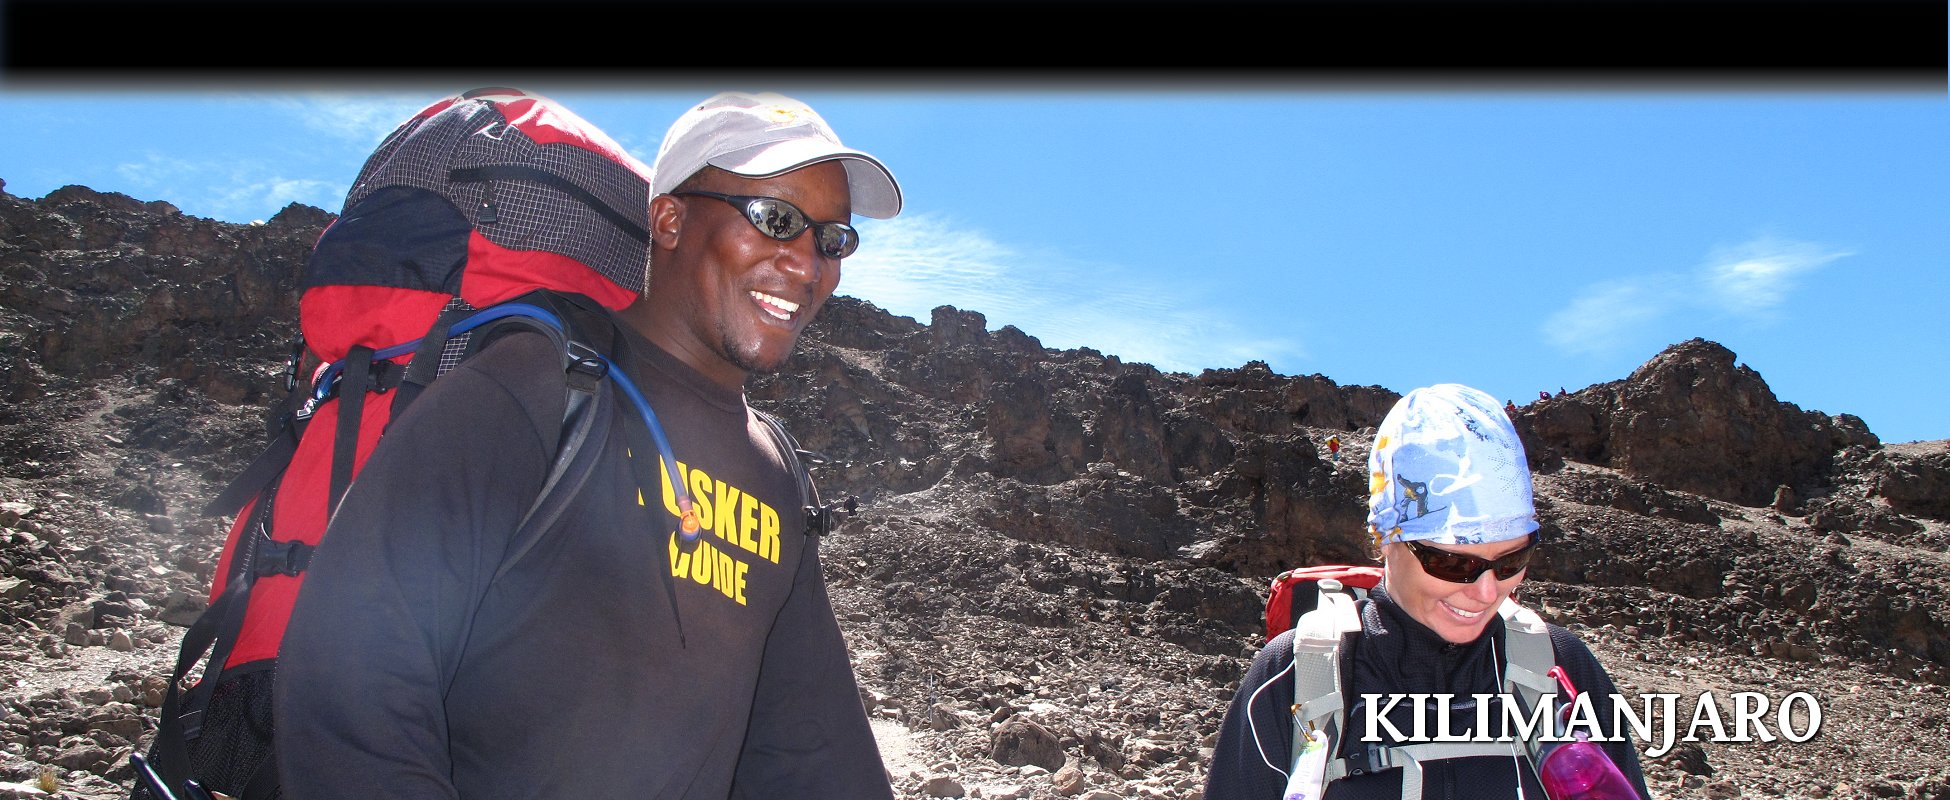 Kilimanjaro Health & Safety